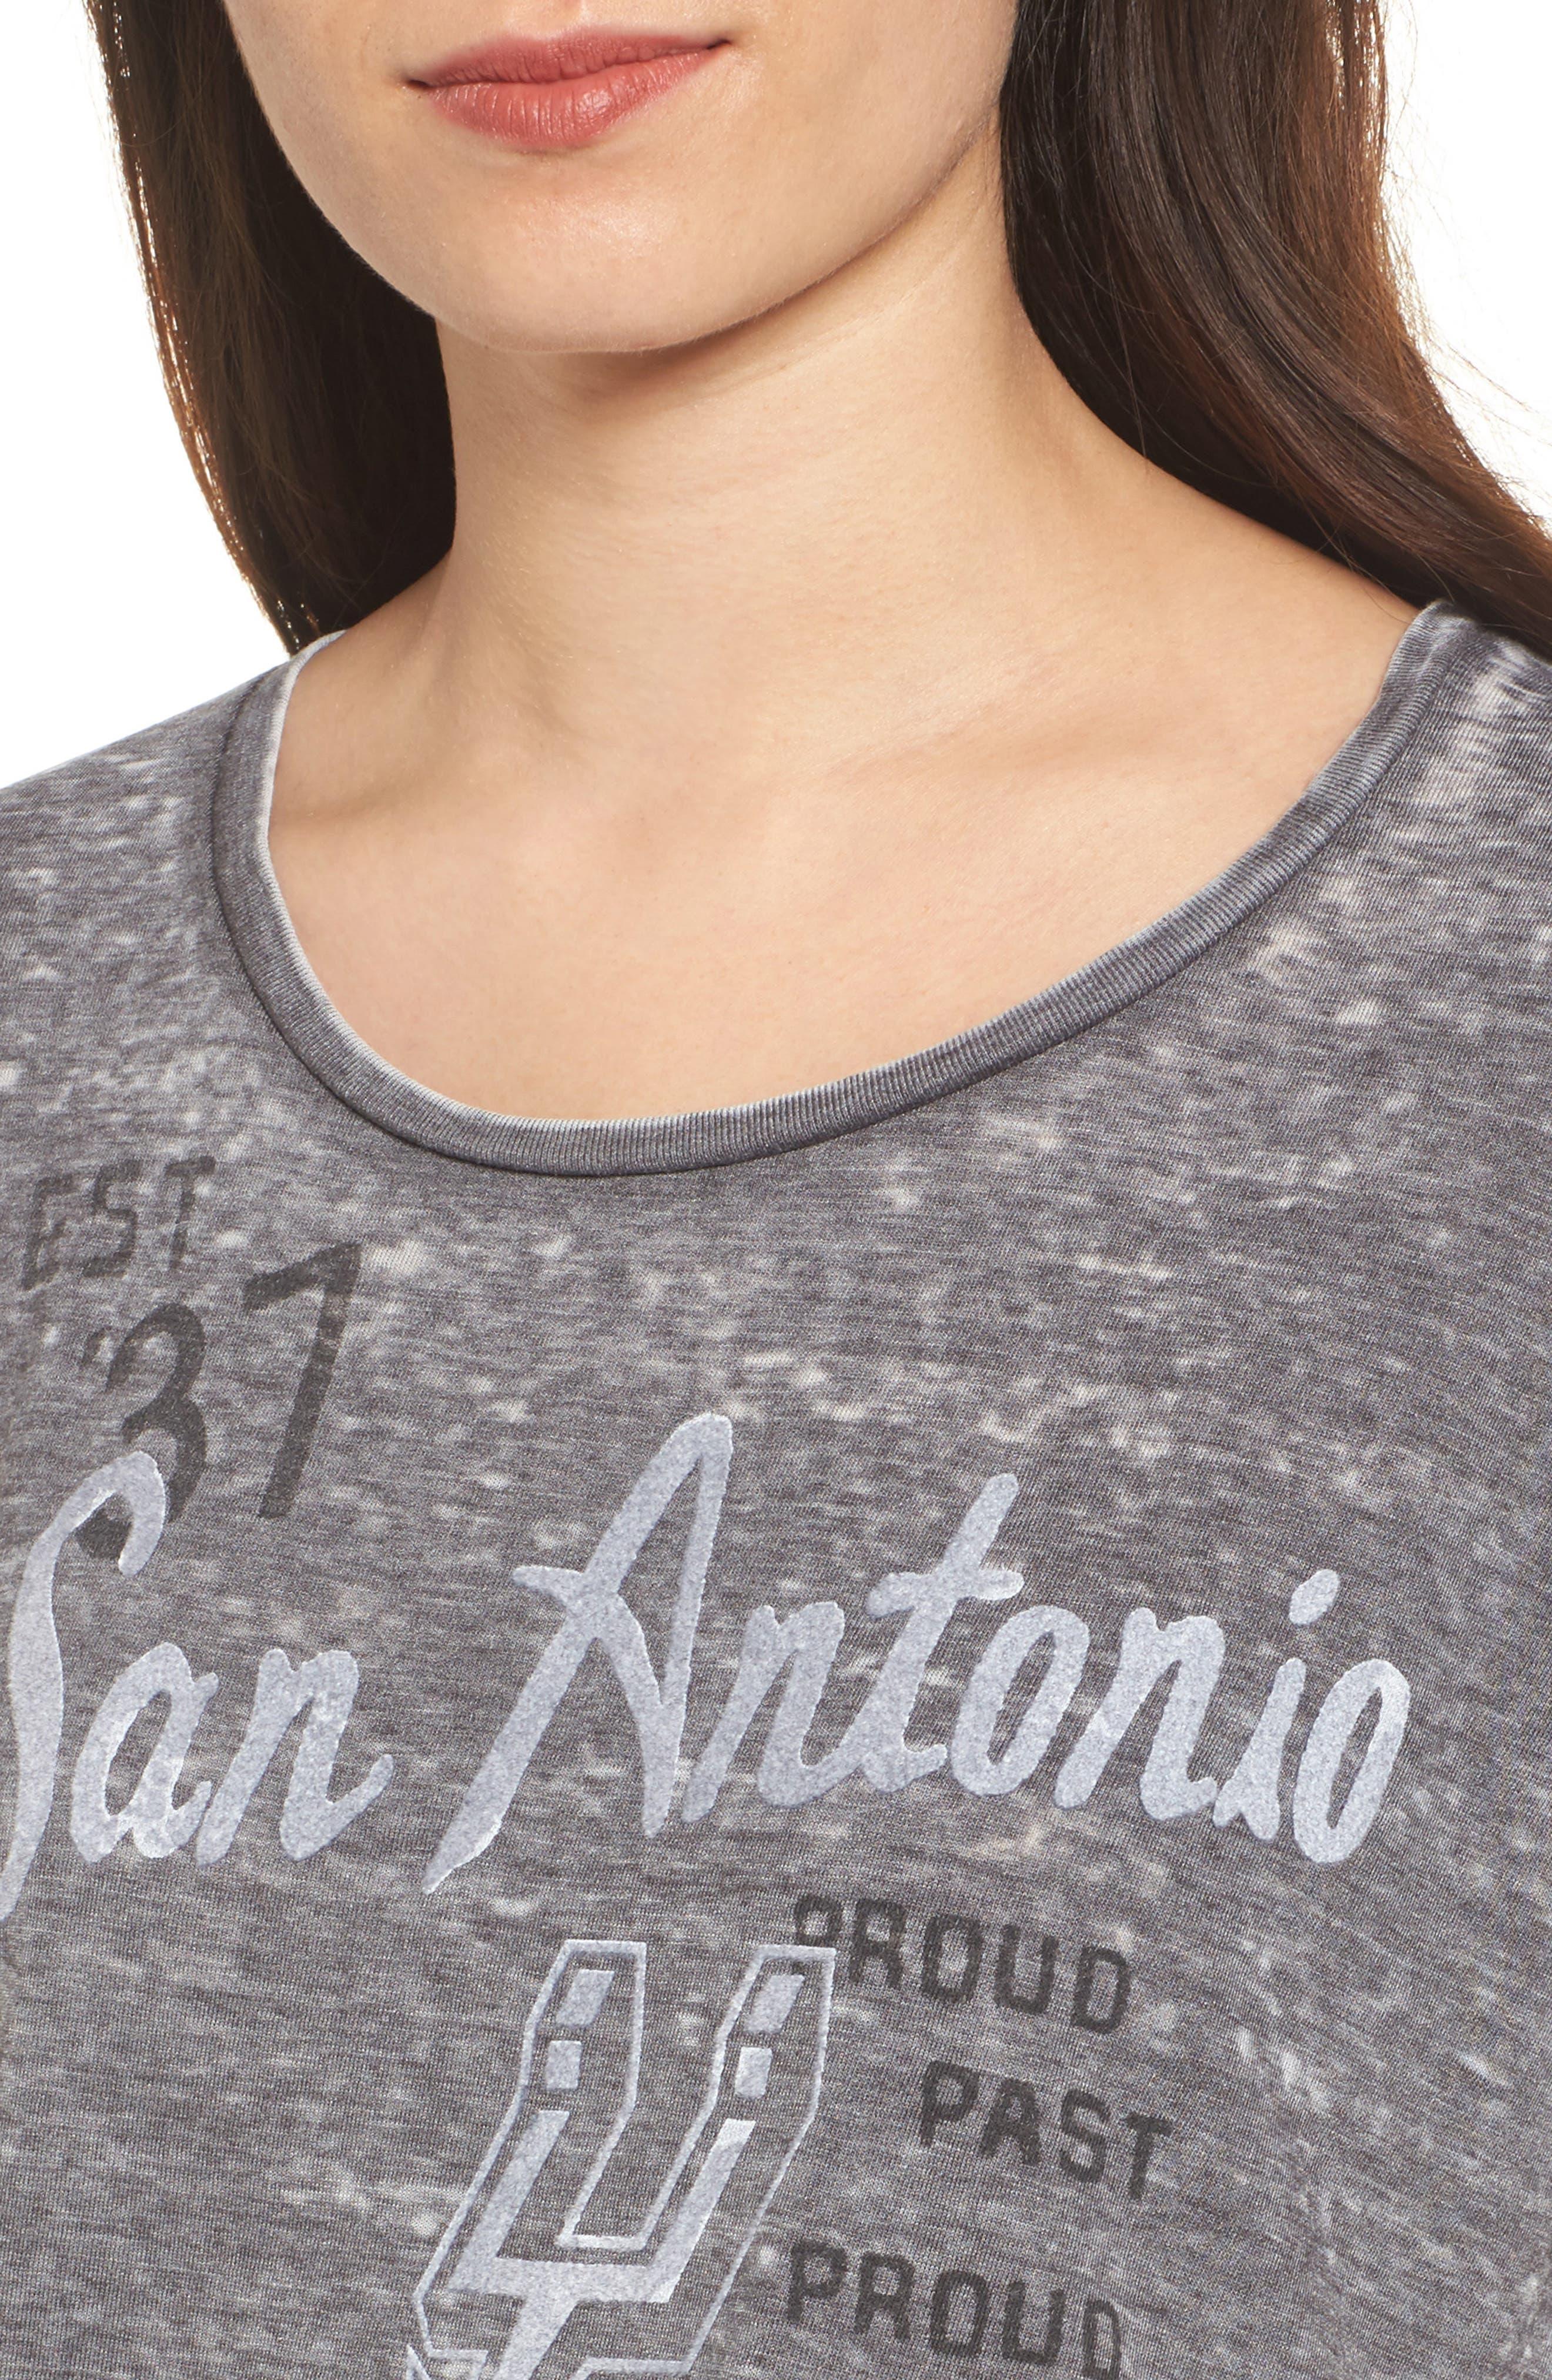 NBA San Antonio Spurs Tee,                             Alternate thumbnail 4, color,                             Black Wash